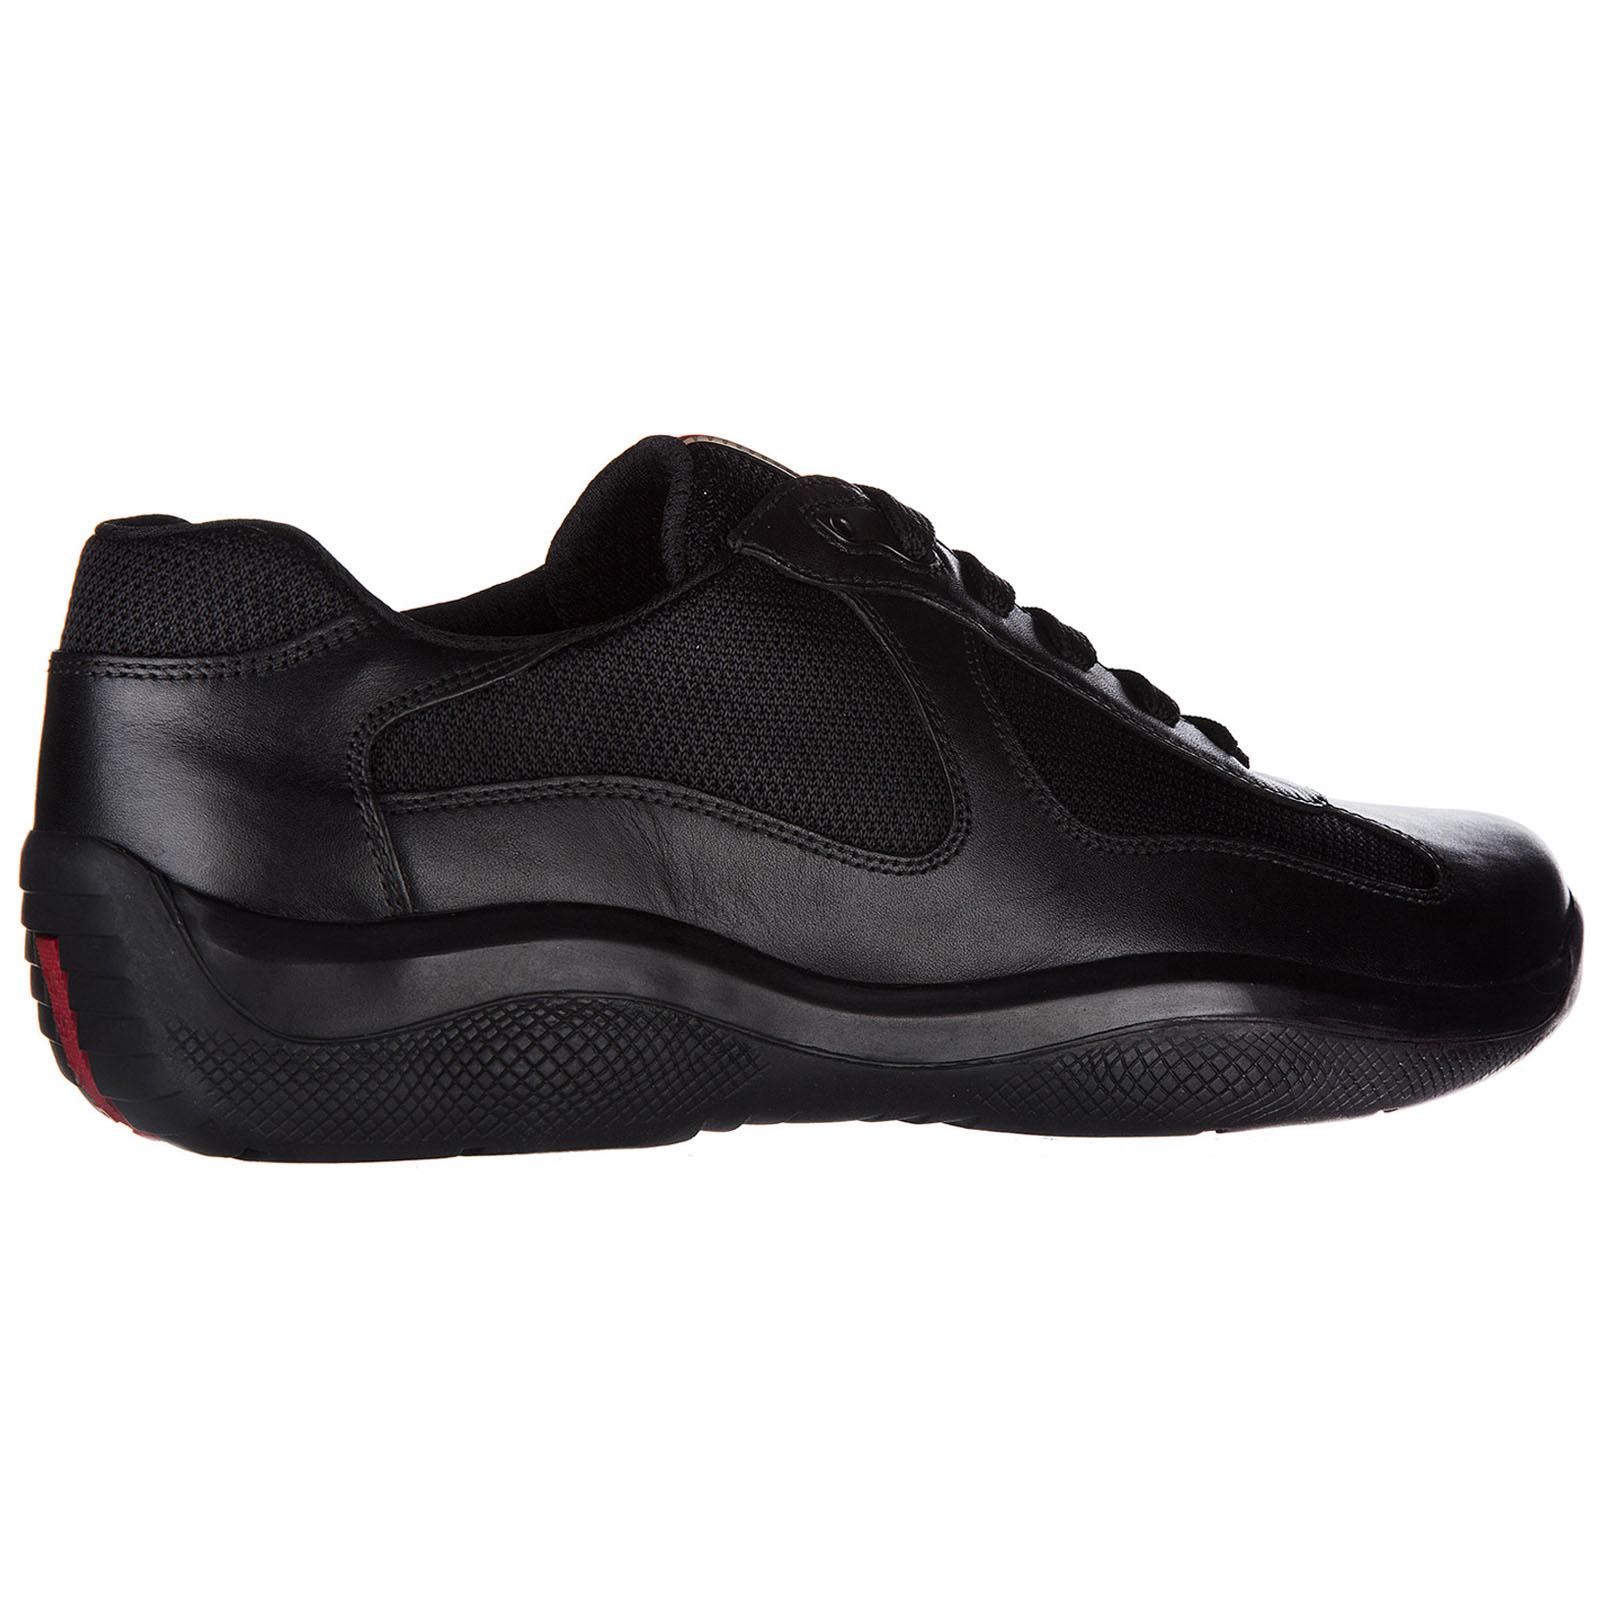 Scarpe sneakers uomo in pelle america s cup